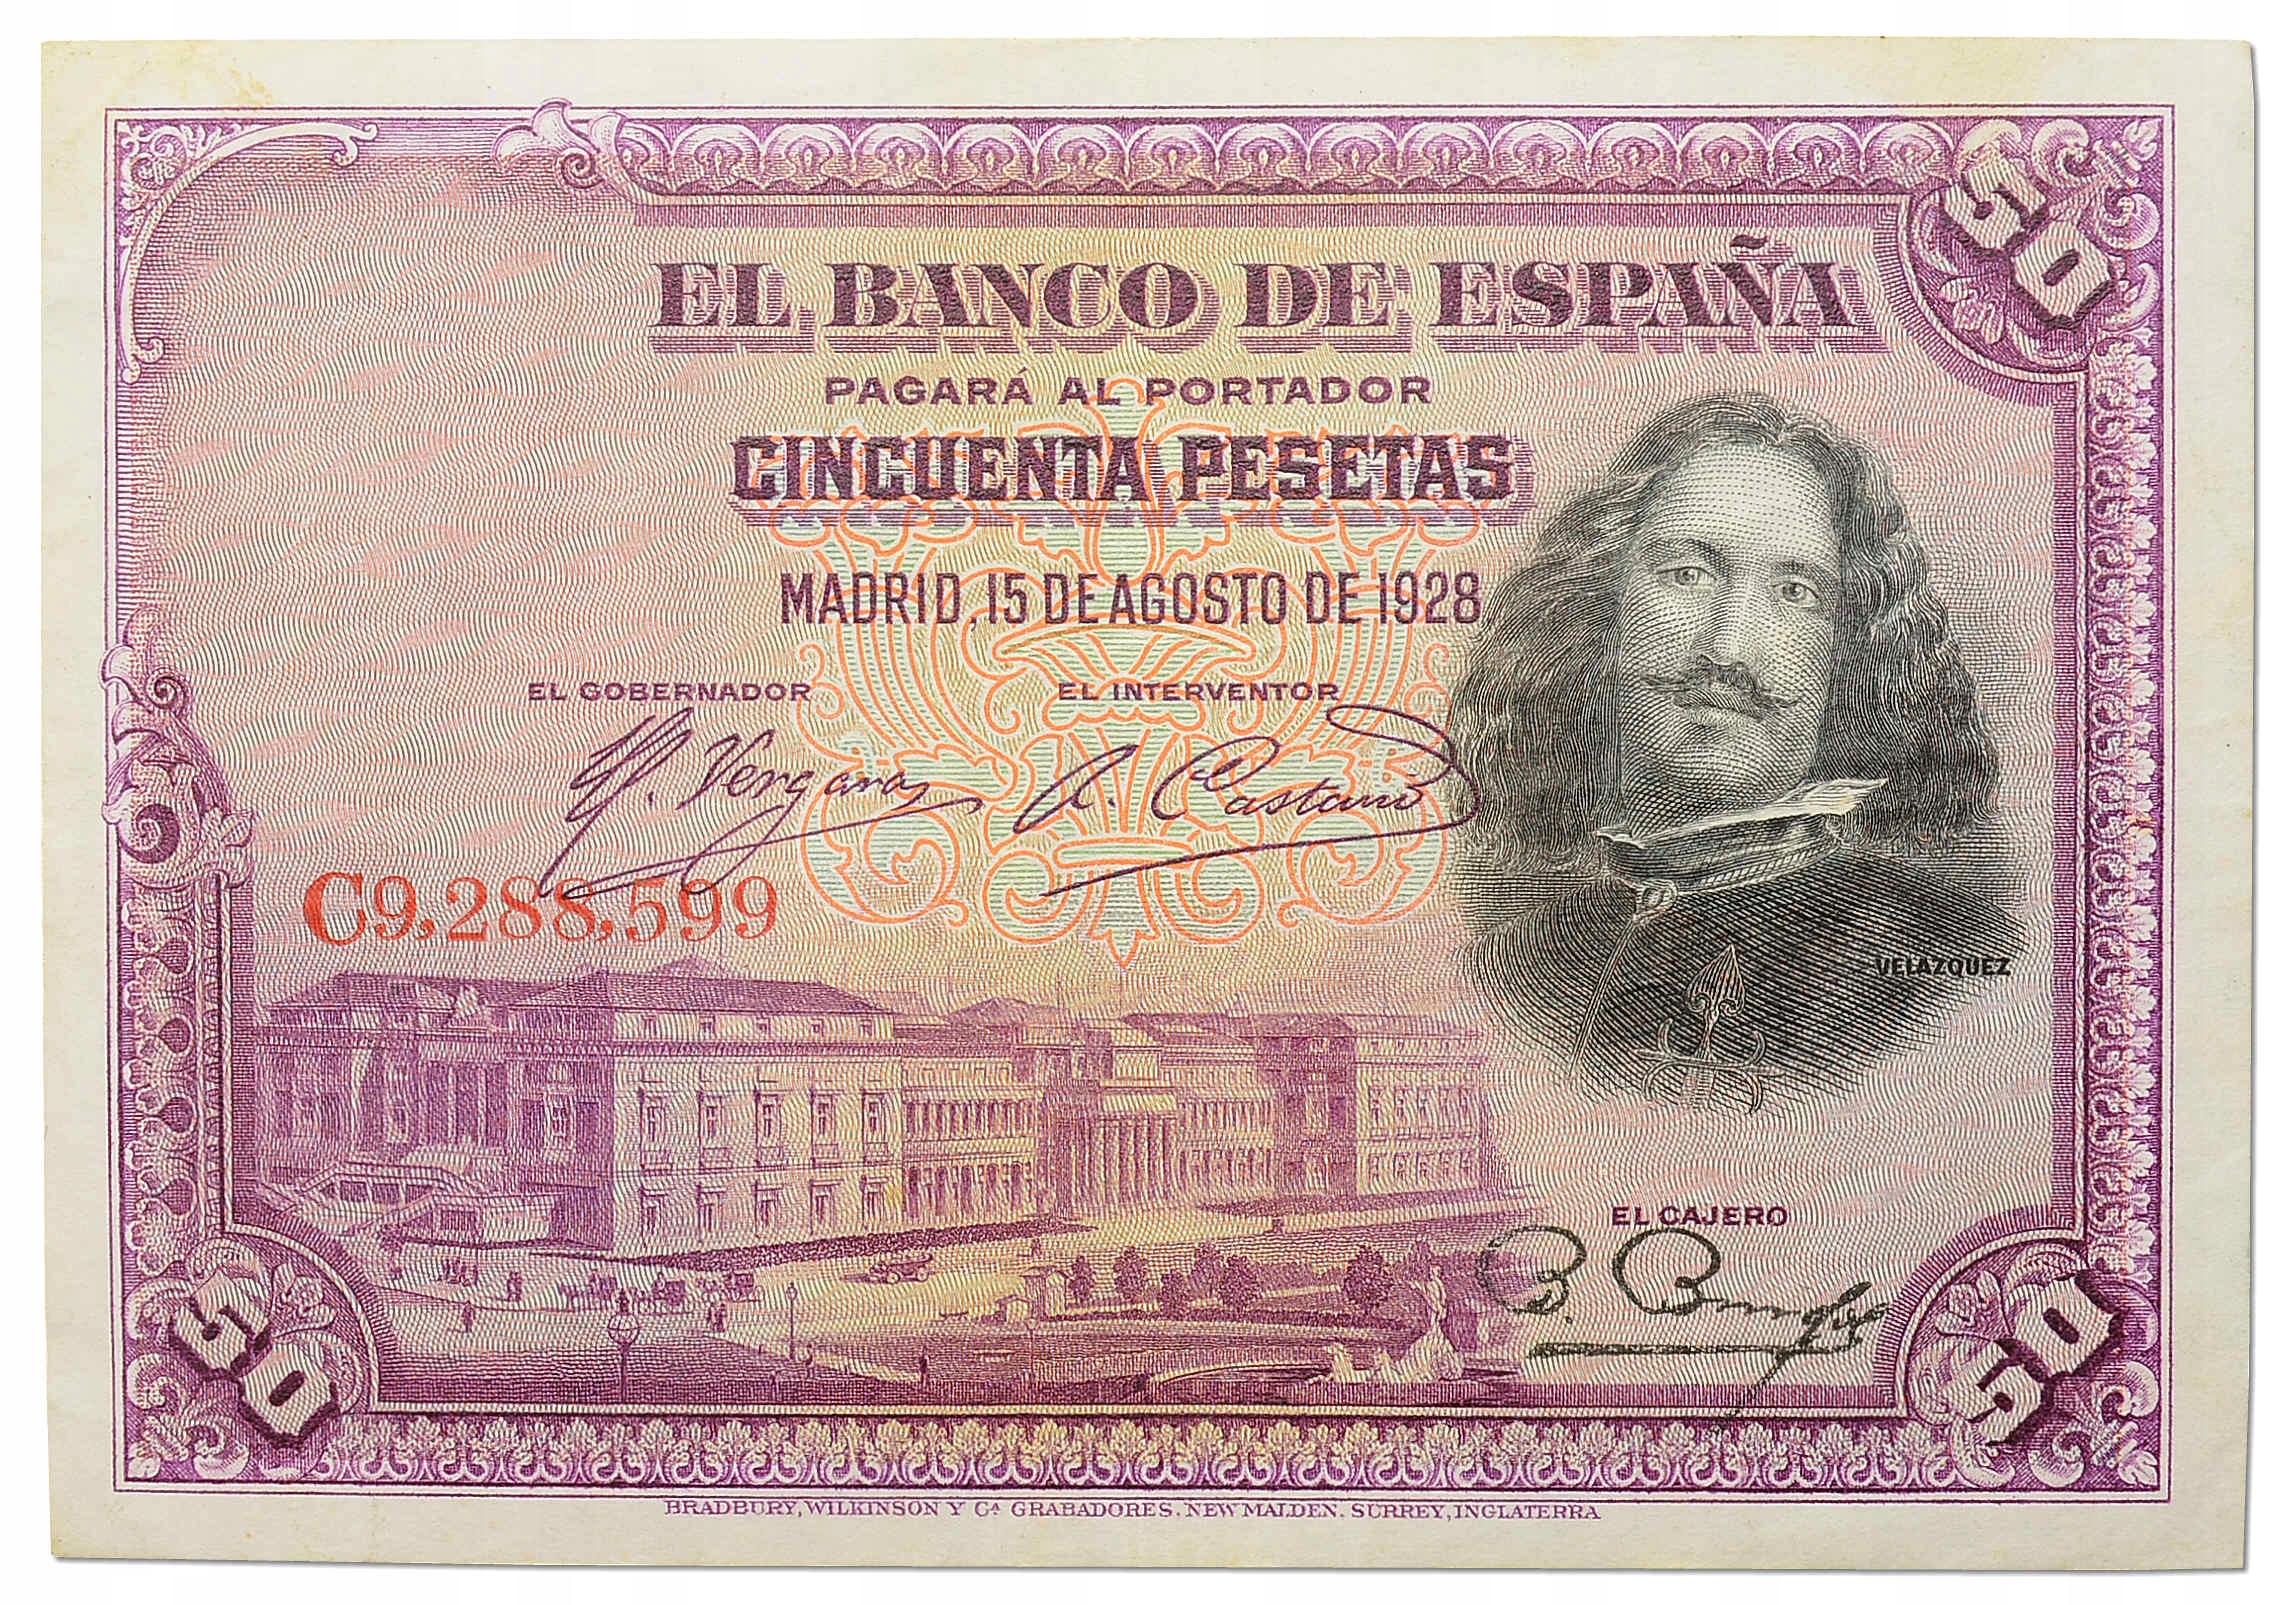 9.Hiszpania, 50 Peset 1928, P.75.b, St.3+